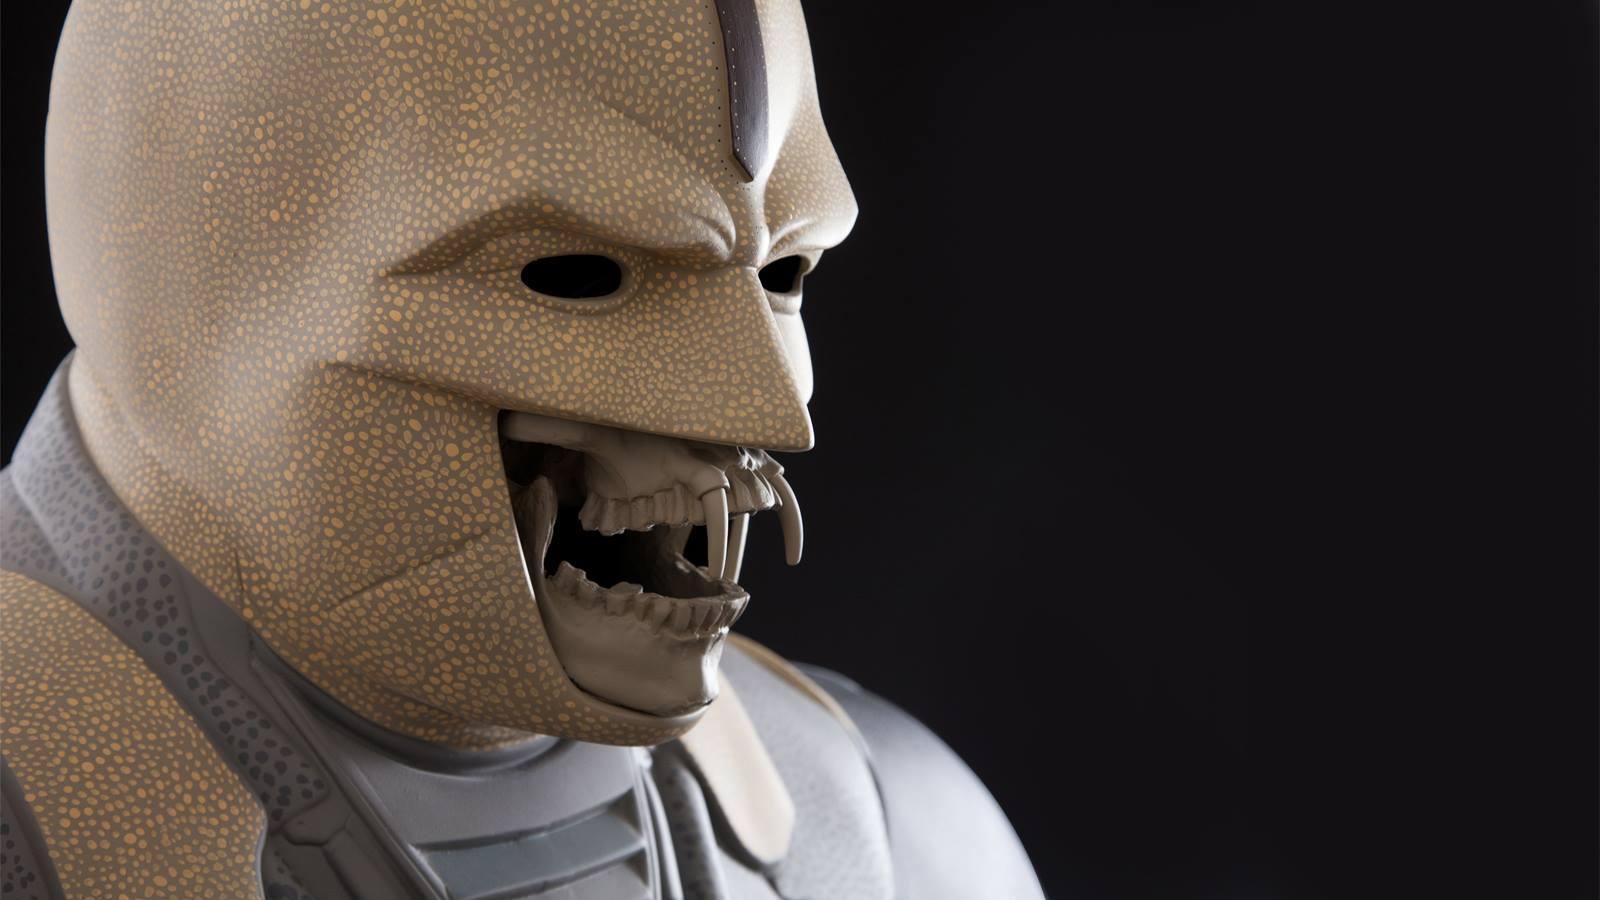 Mr Mitote Batman 75 MX Photography- Sebastian Sepulveda teeth